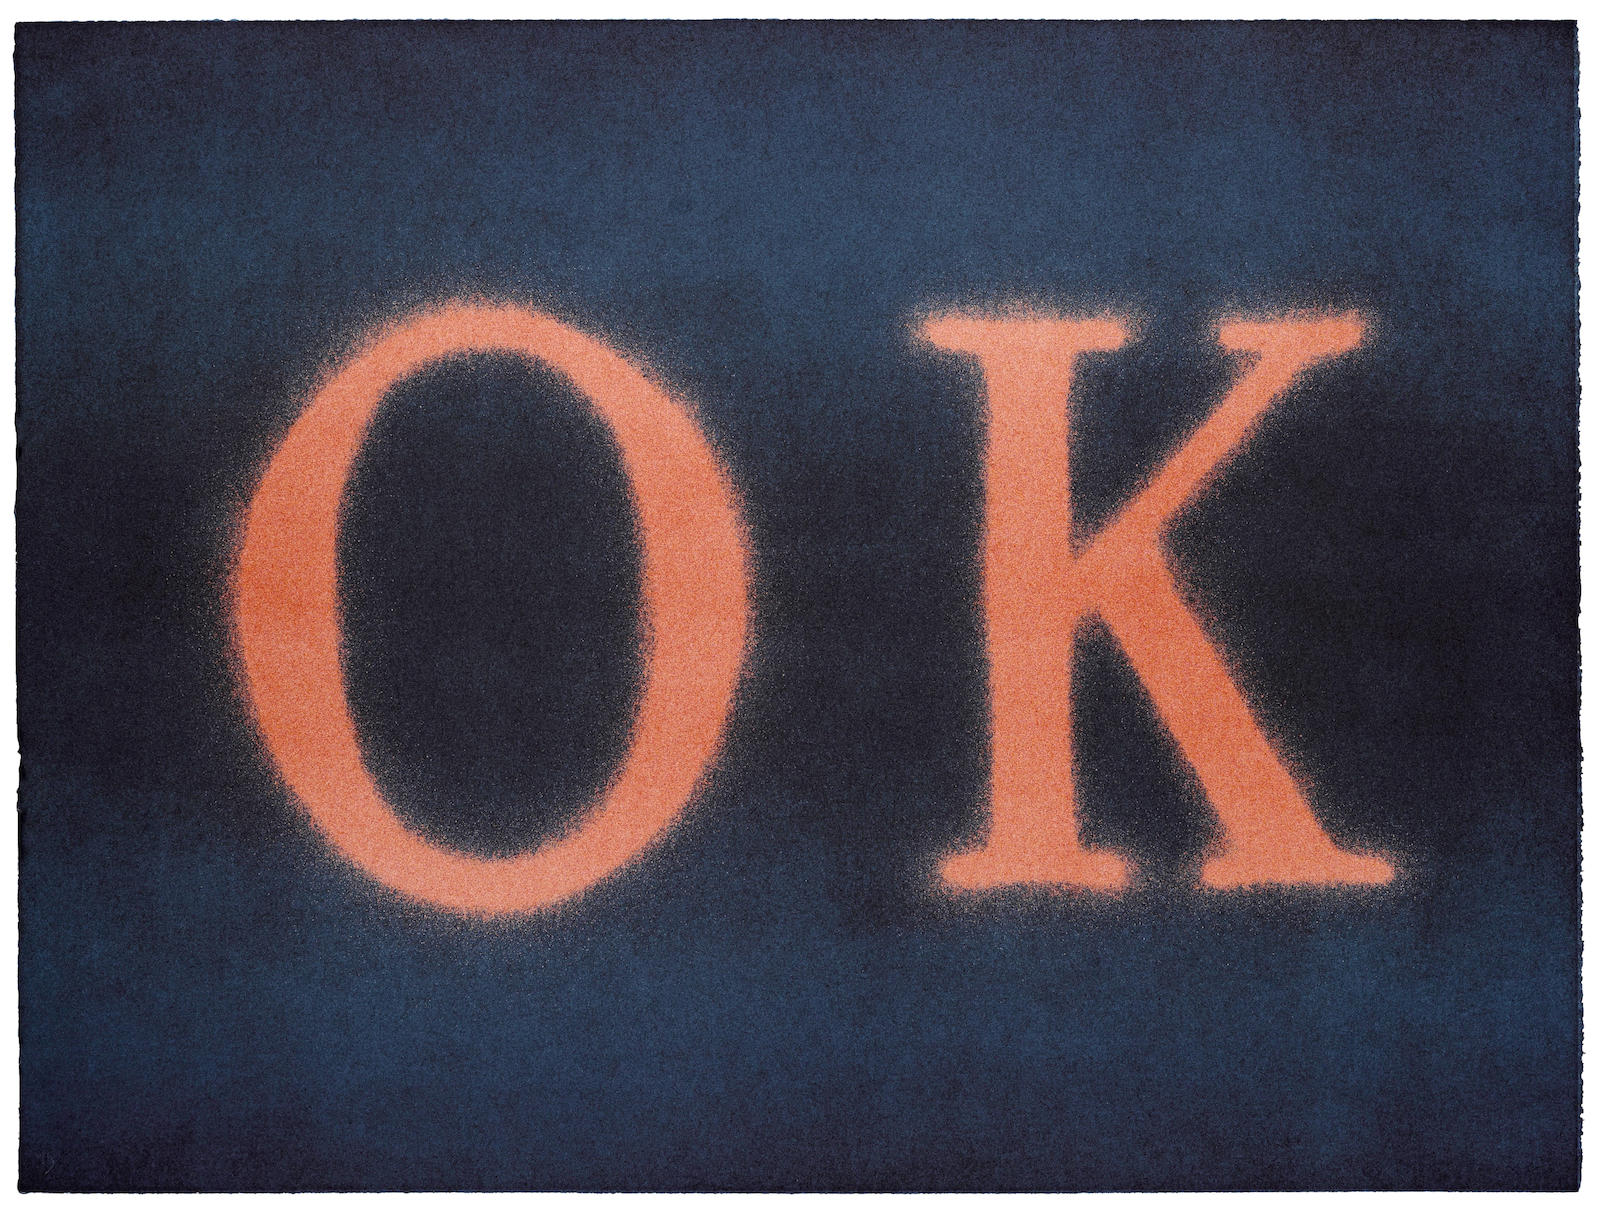 Ed Ruscha-OK (State I)-1990